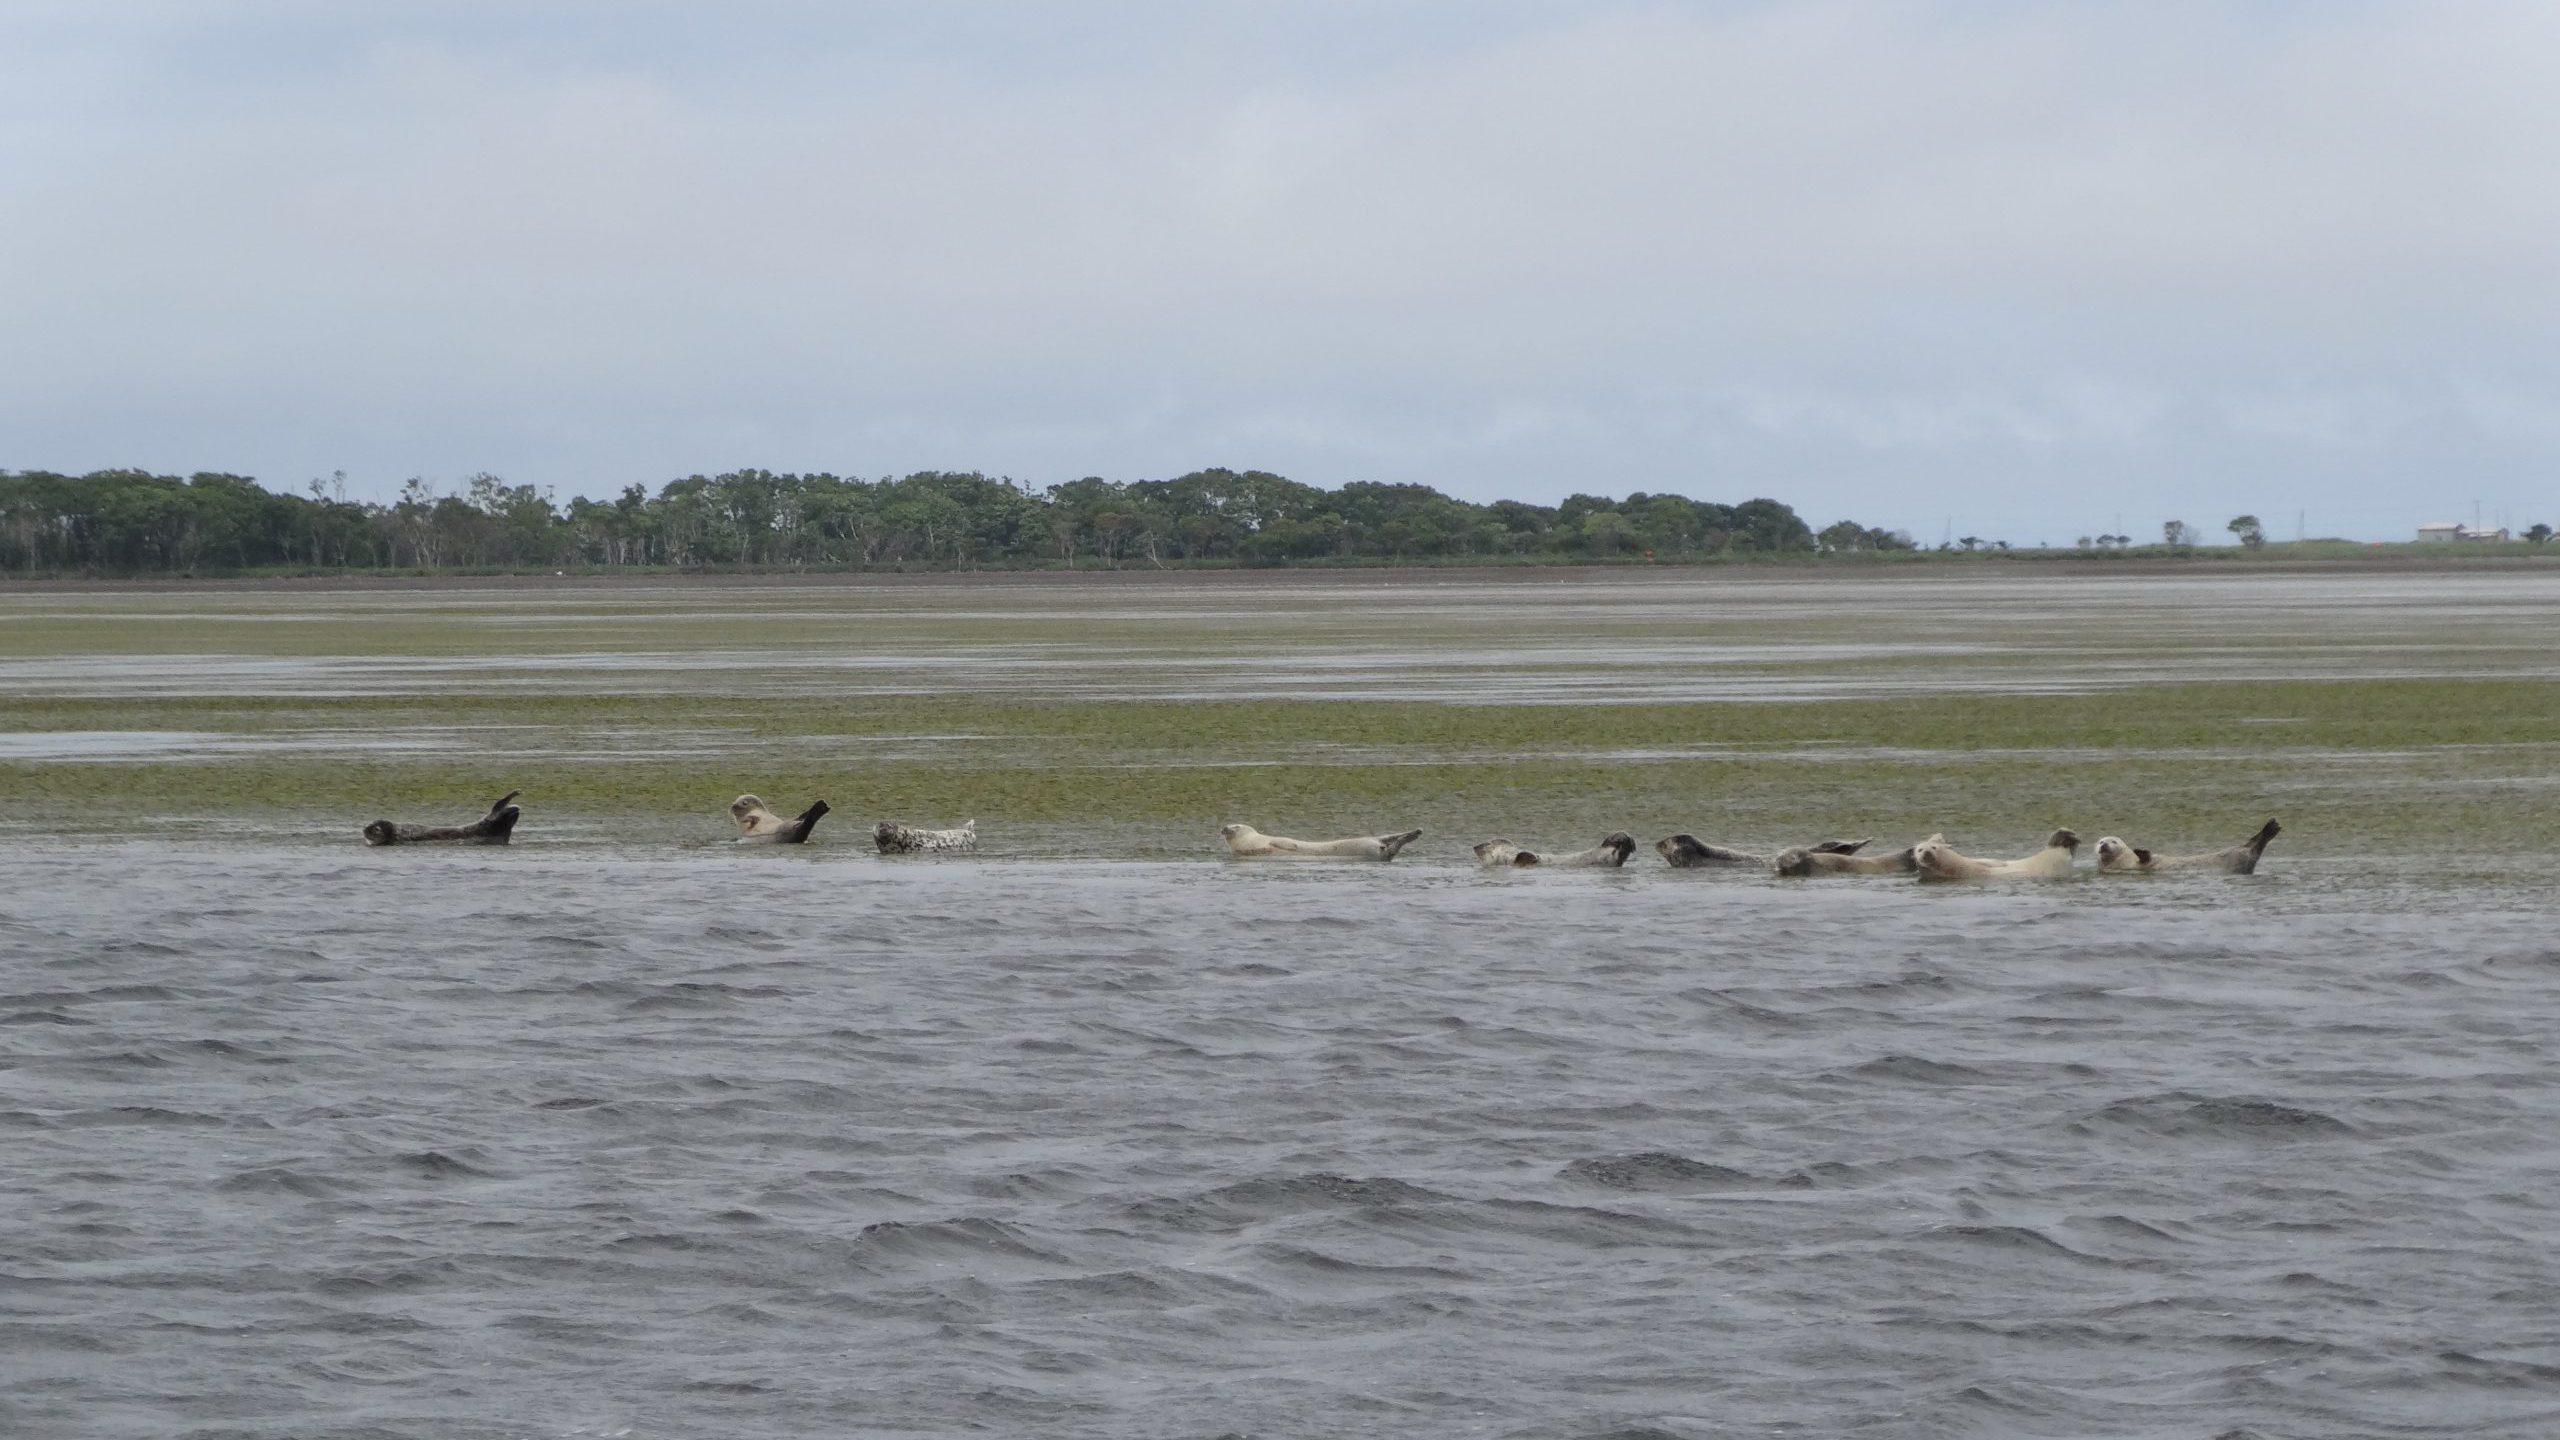 Notsuke Peninsula and Wildlife Cruises